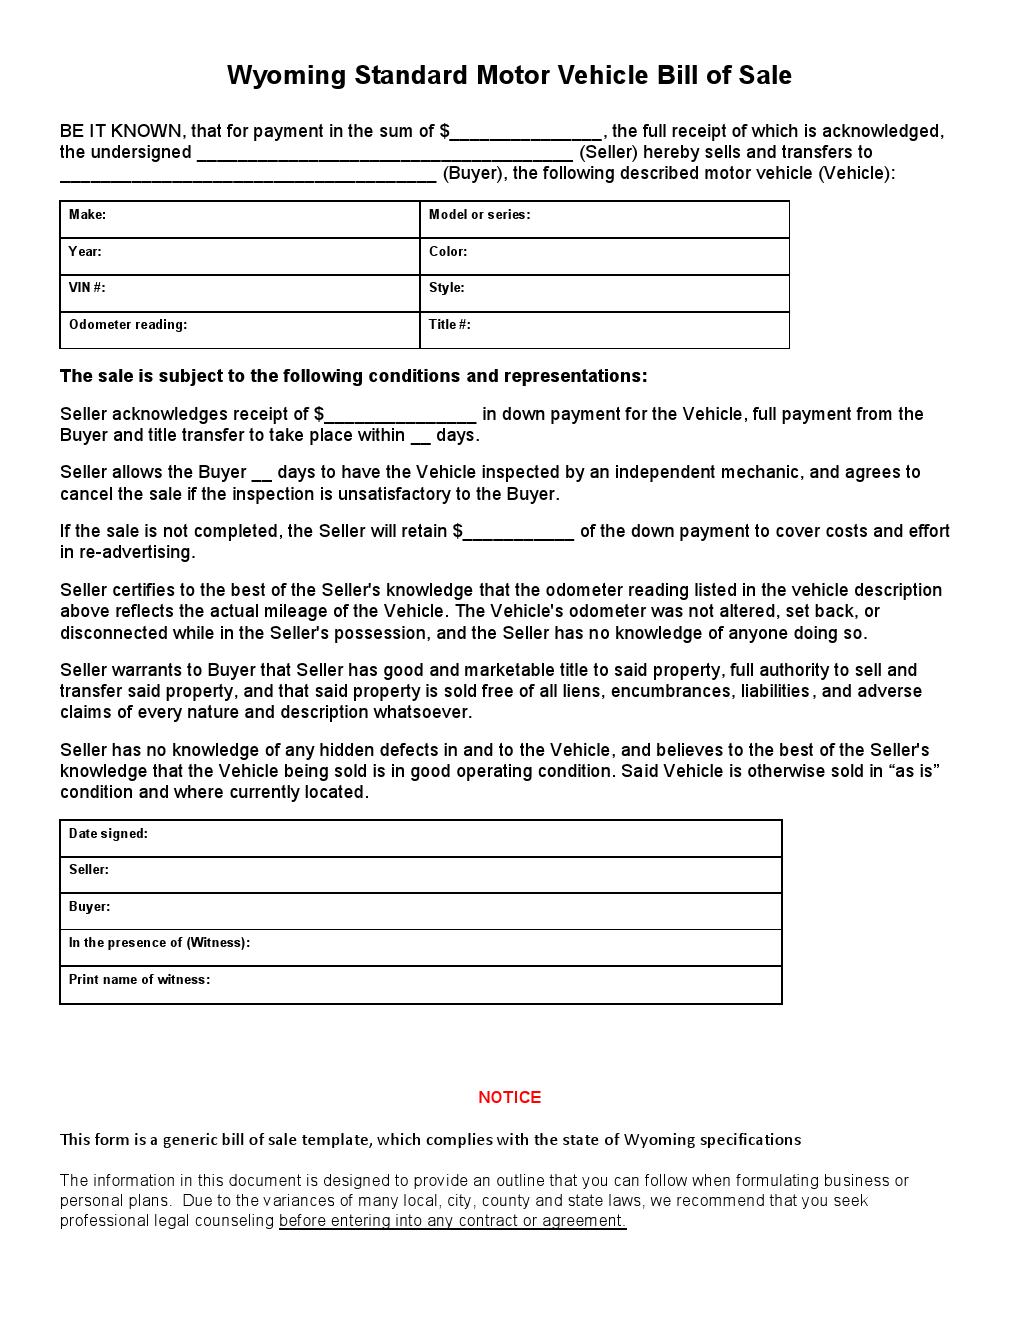 Free wyoming standard motor vehicle bill of sale form for Motor vehicle for sale